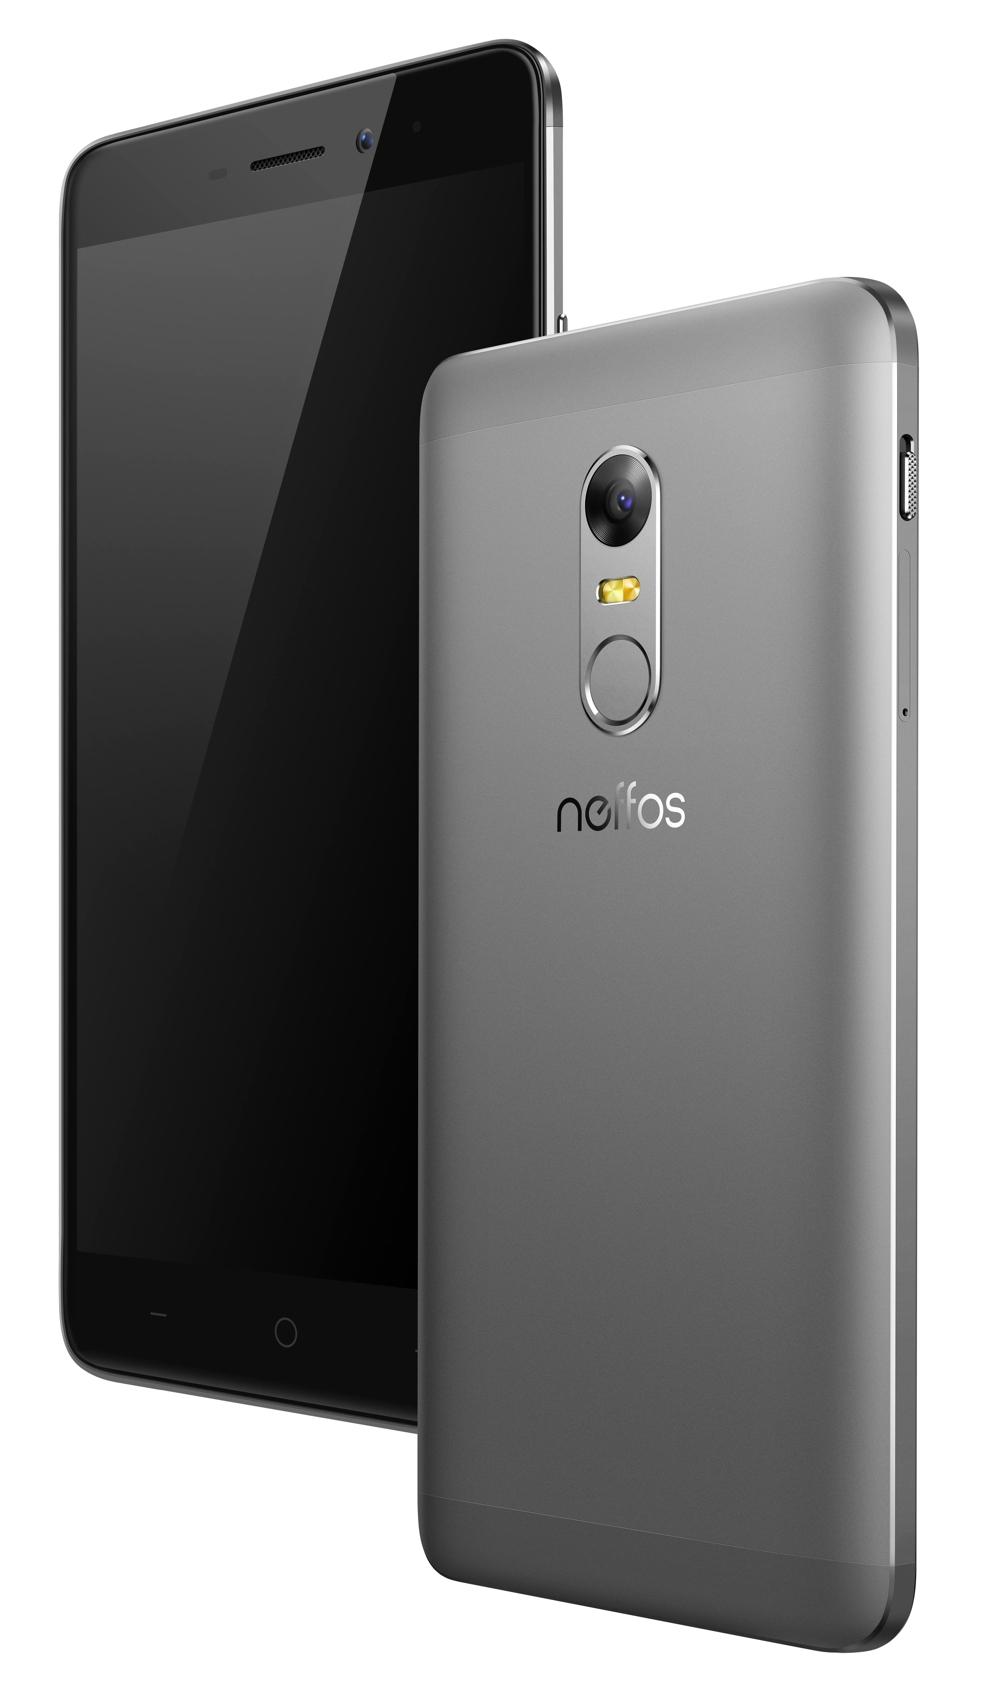 Izpārdošana - TP-LINK NEFFOS X1 2GB/16GB CLOUDY GREY Mobilais Telefons